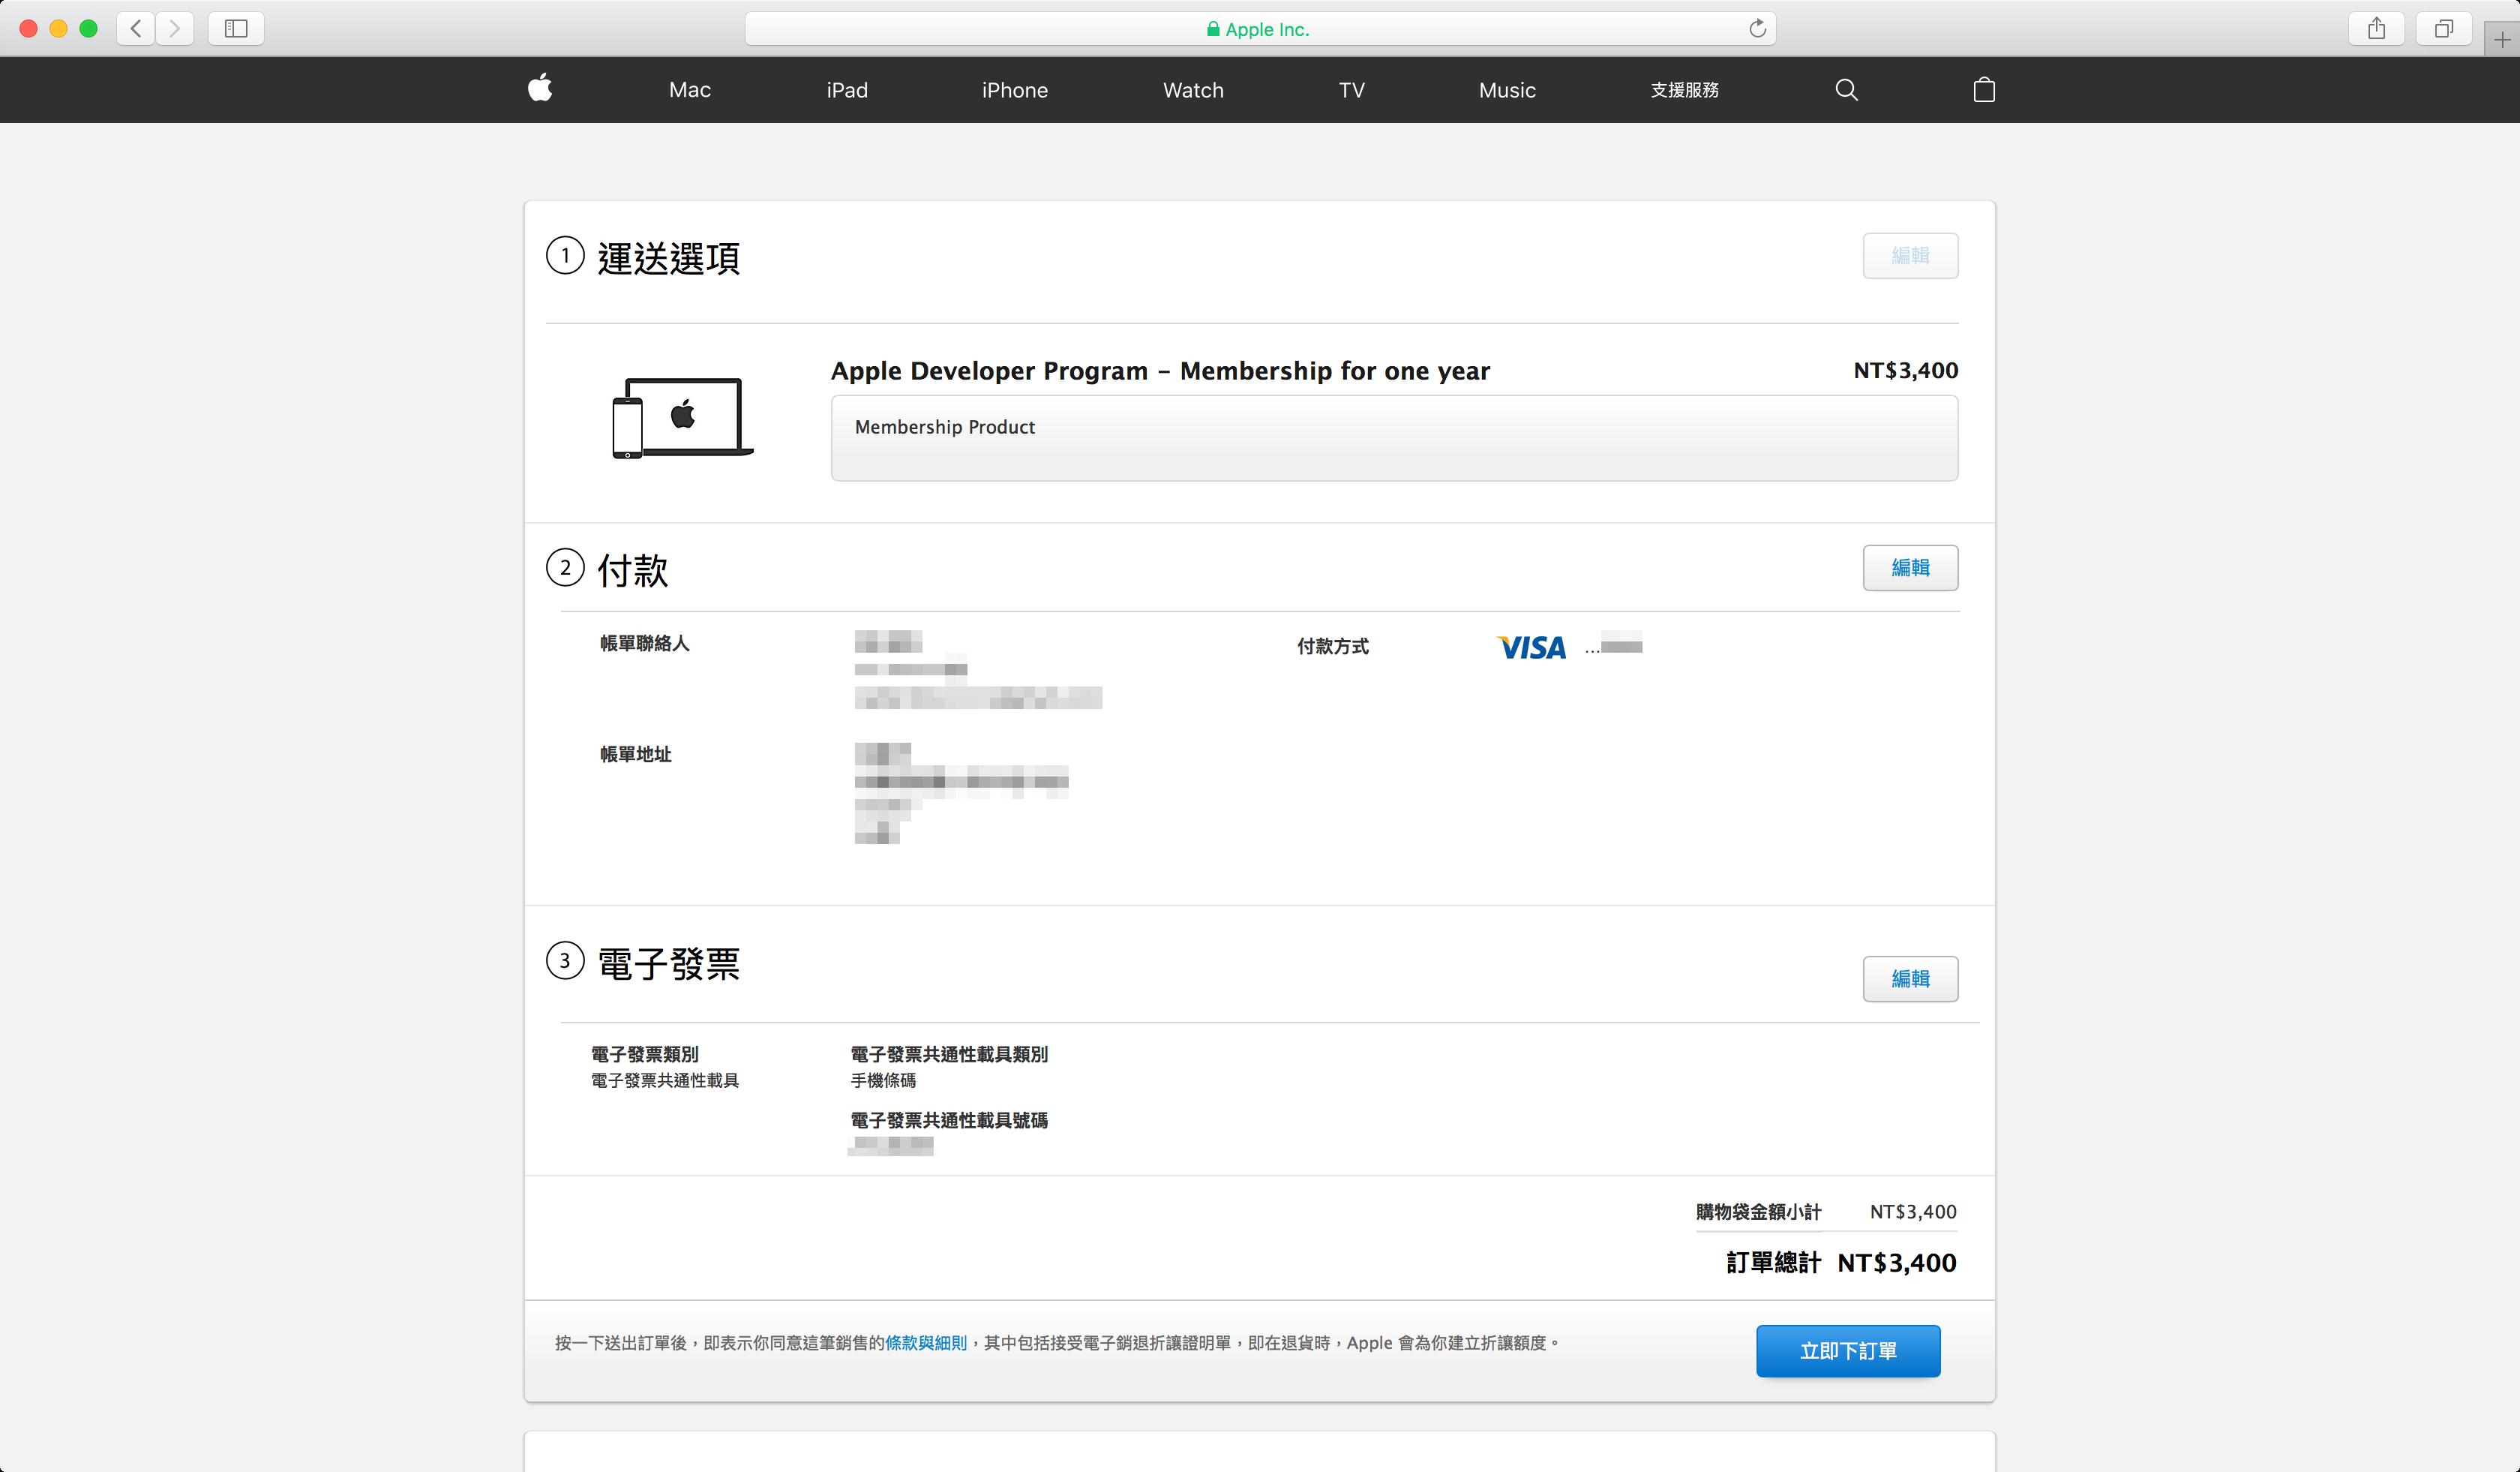 Apple online store - Confirm